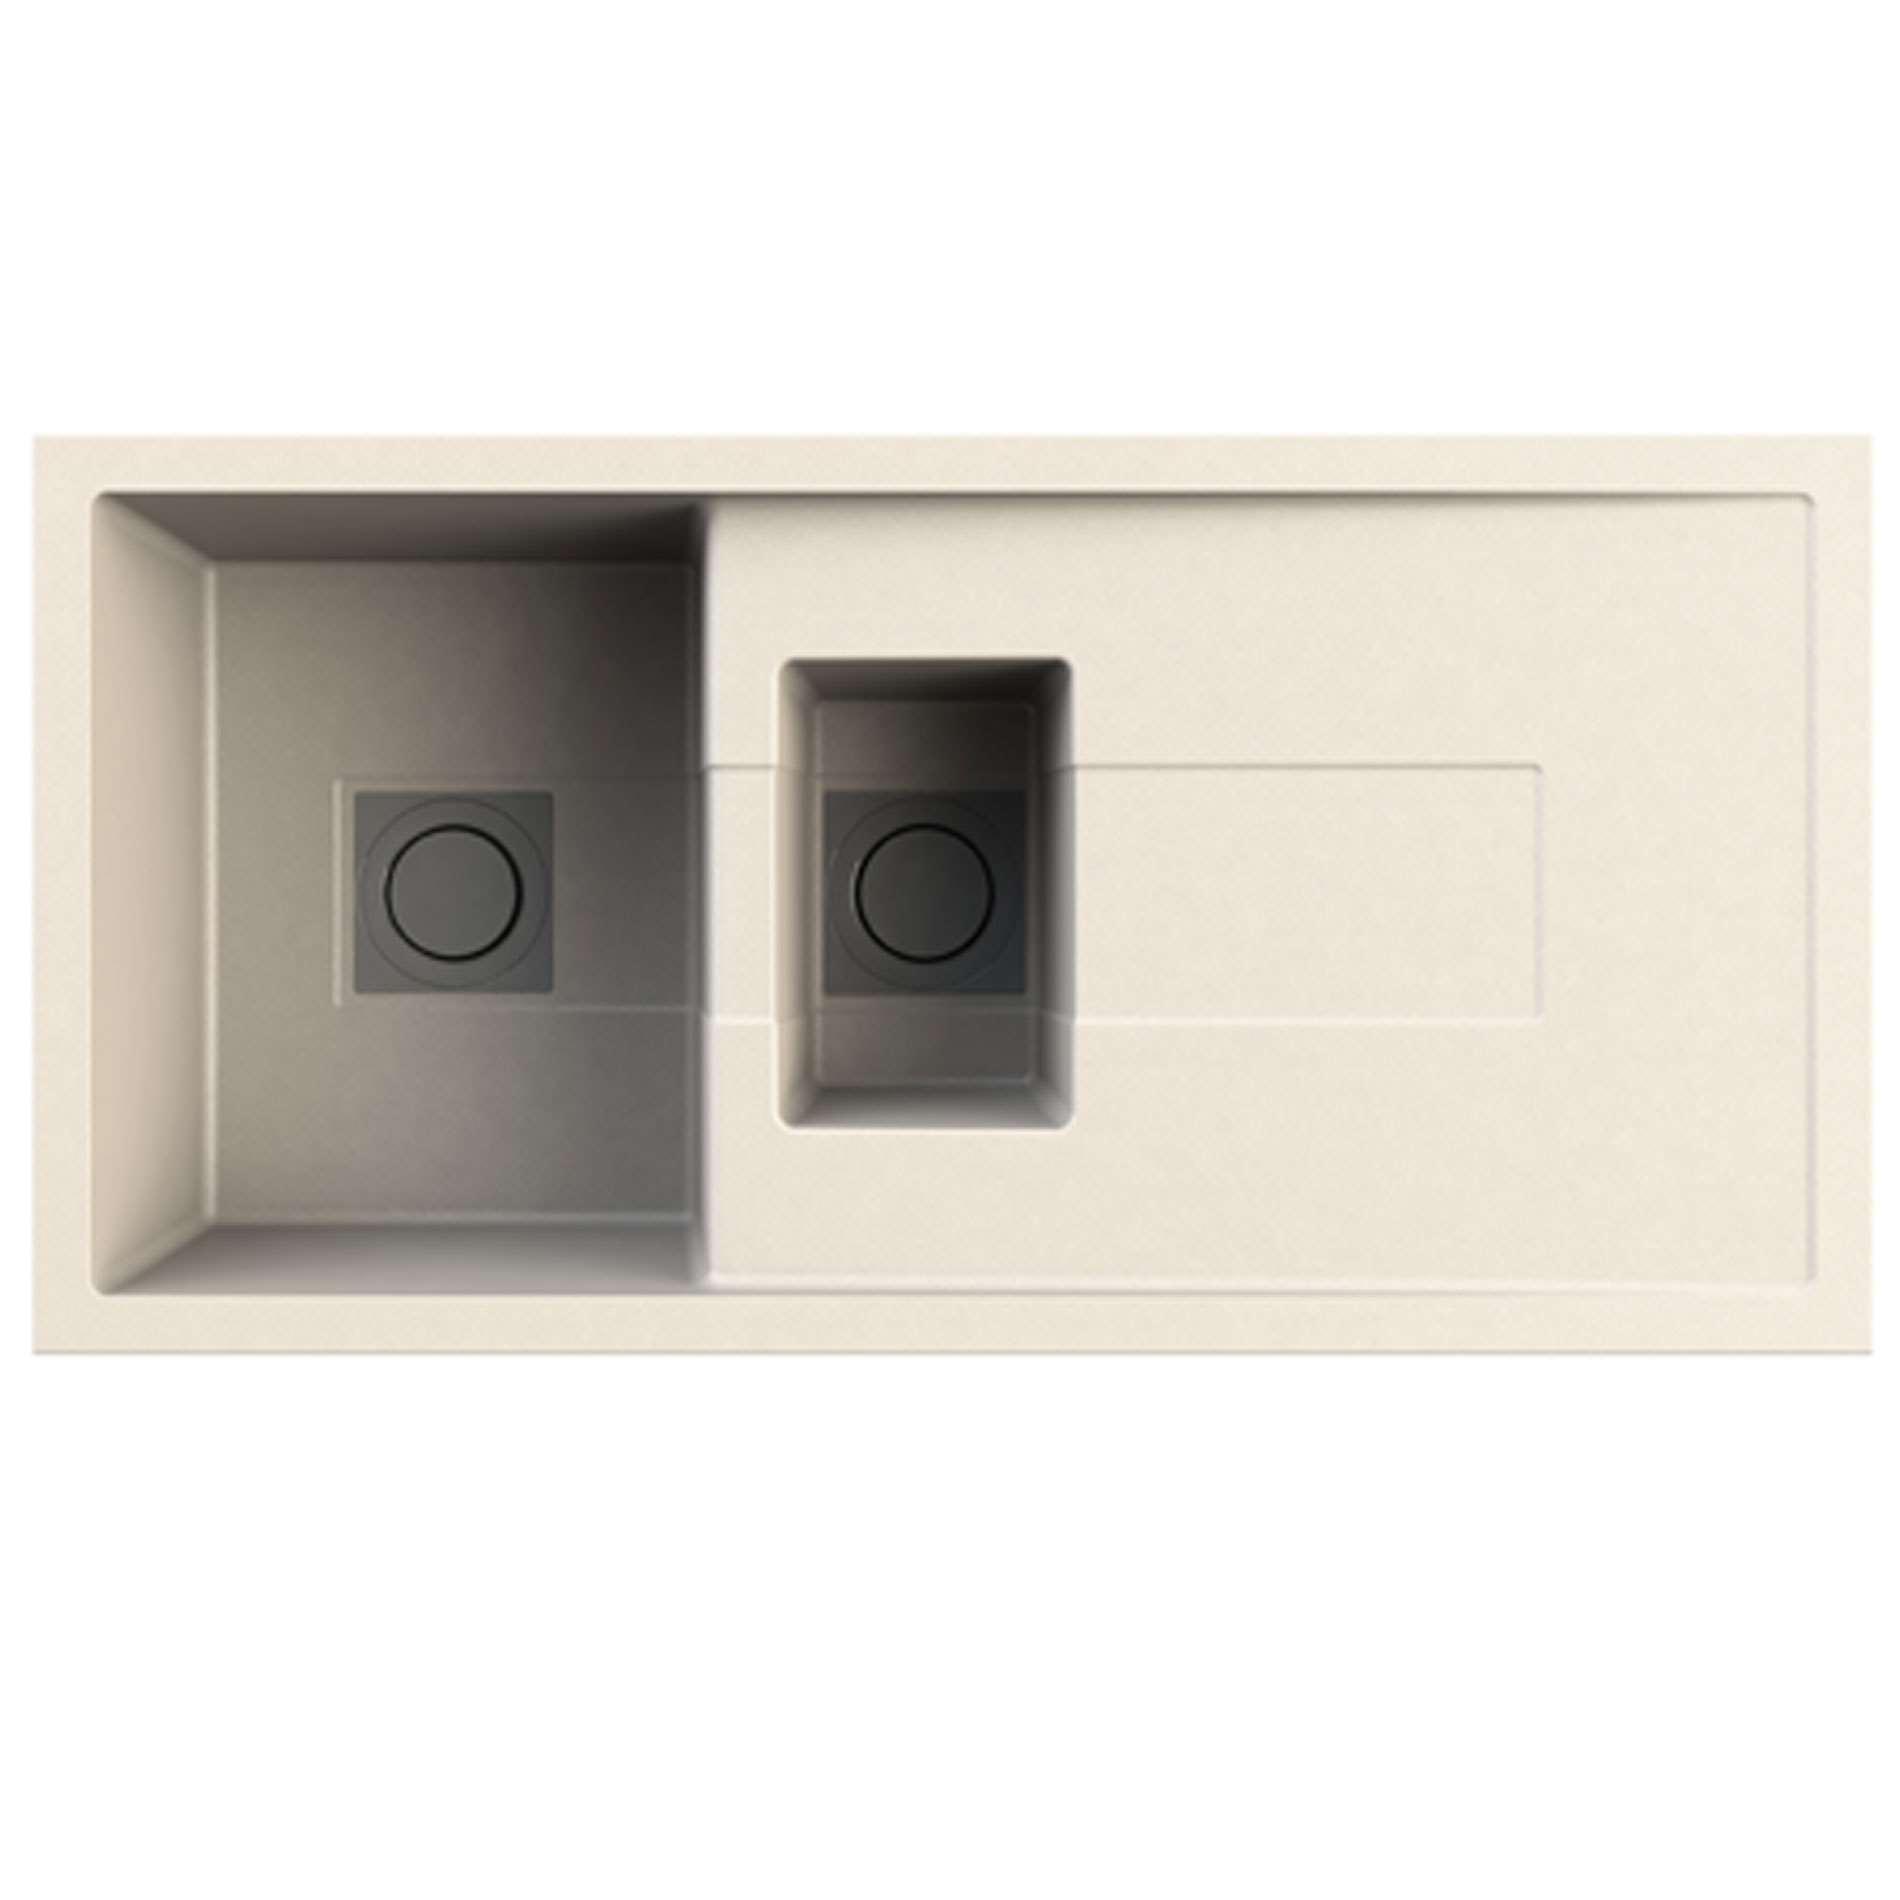 Franke Kitchen Sinks Granite Composite Granite Composite Kitchen Sinks Taps